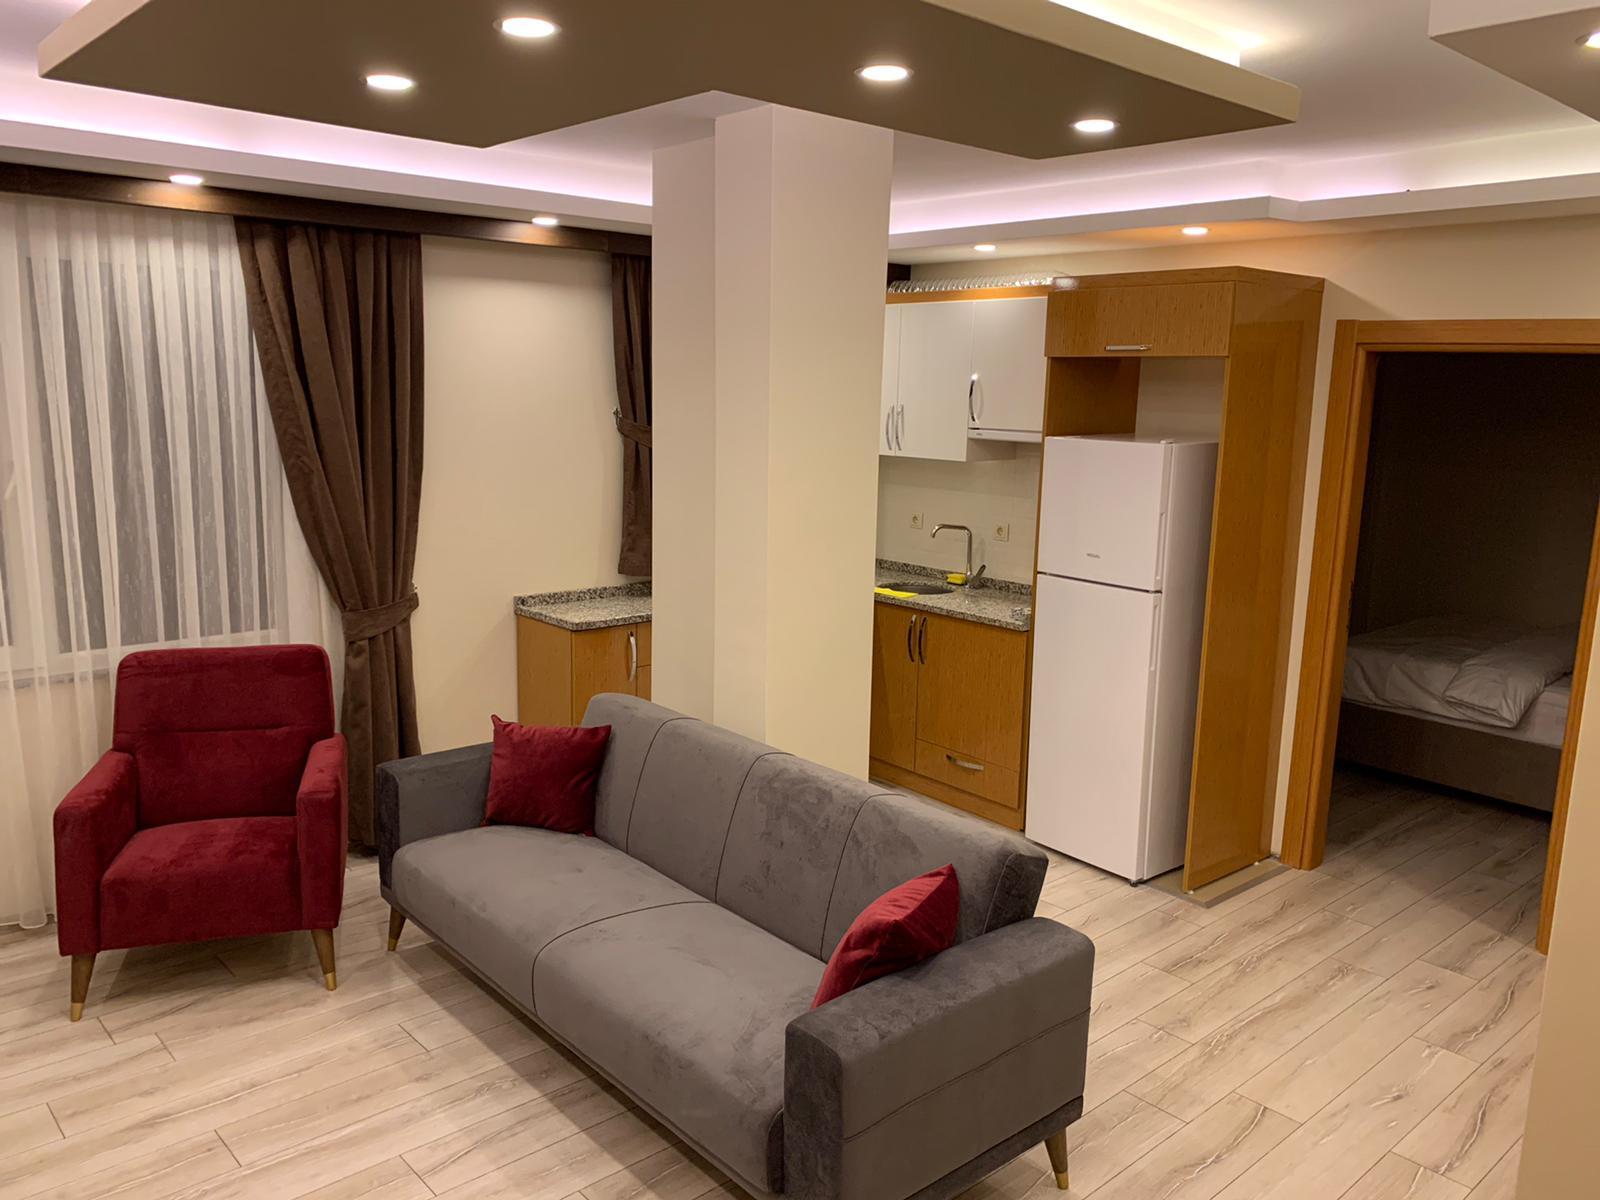 Kaliteli Otel Hizmetleri